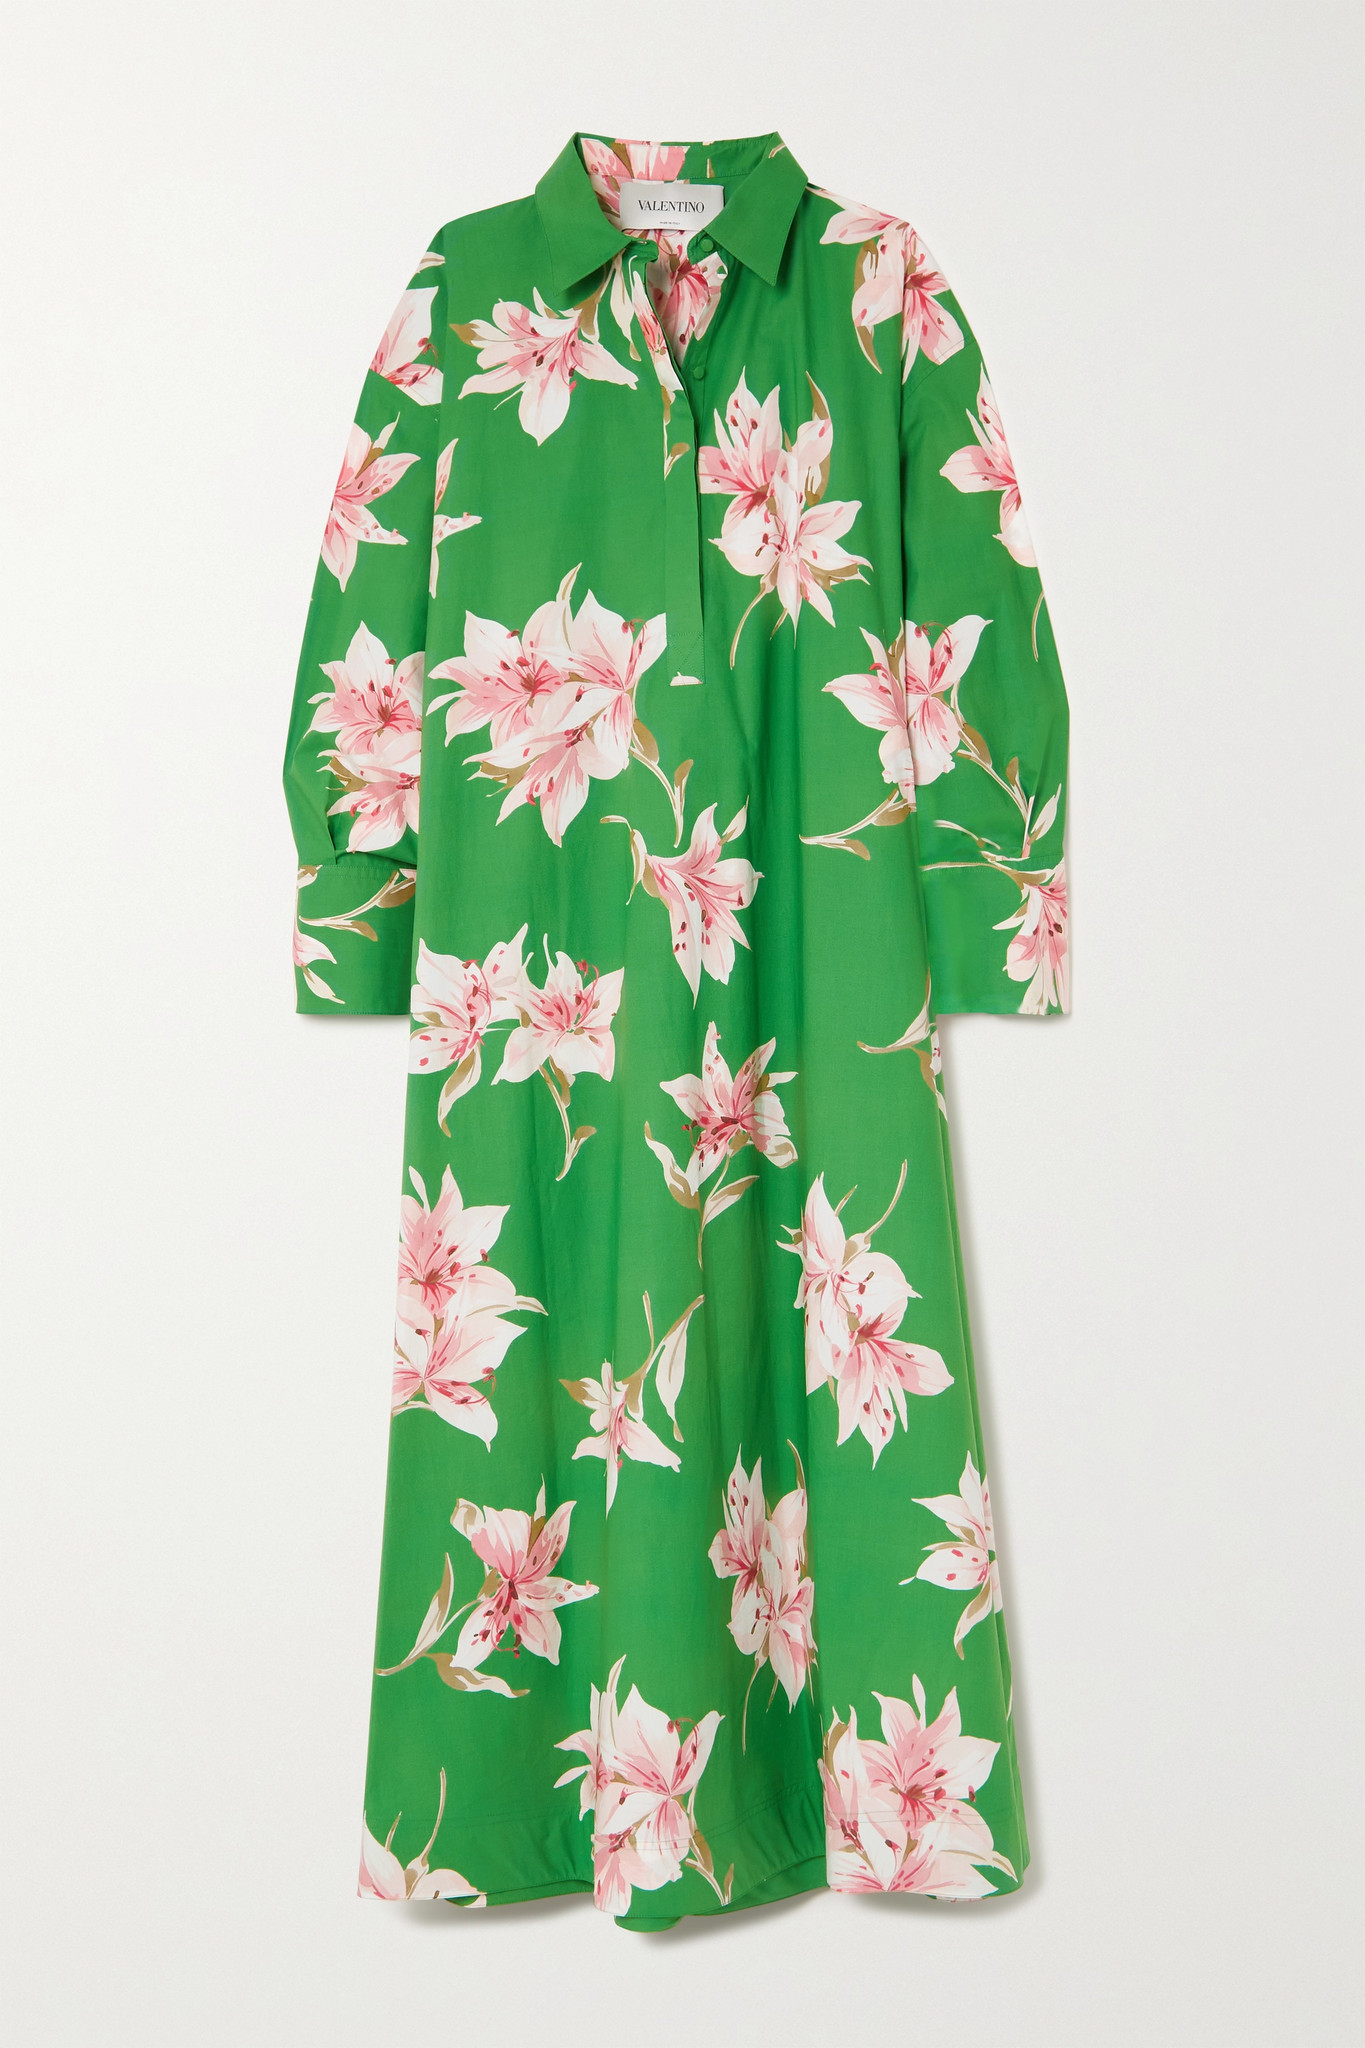 VALENTINO - 花卉印花纯棉府绸衬衫式超长连衣裙 - 绿色 - IT40